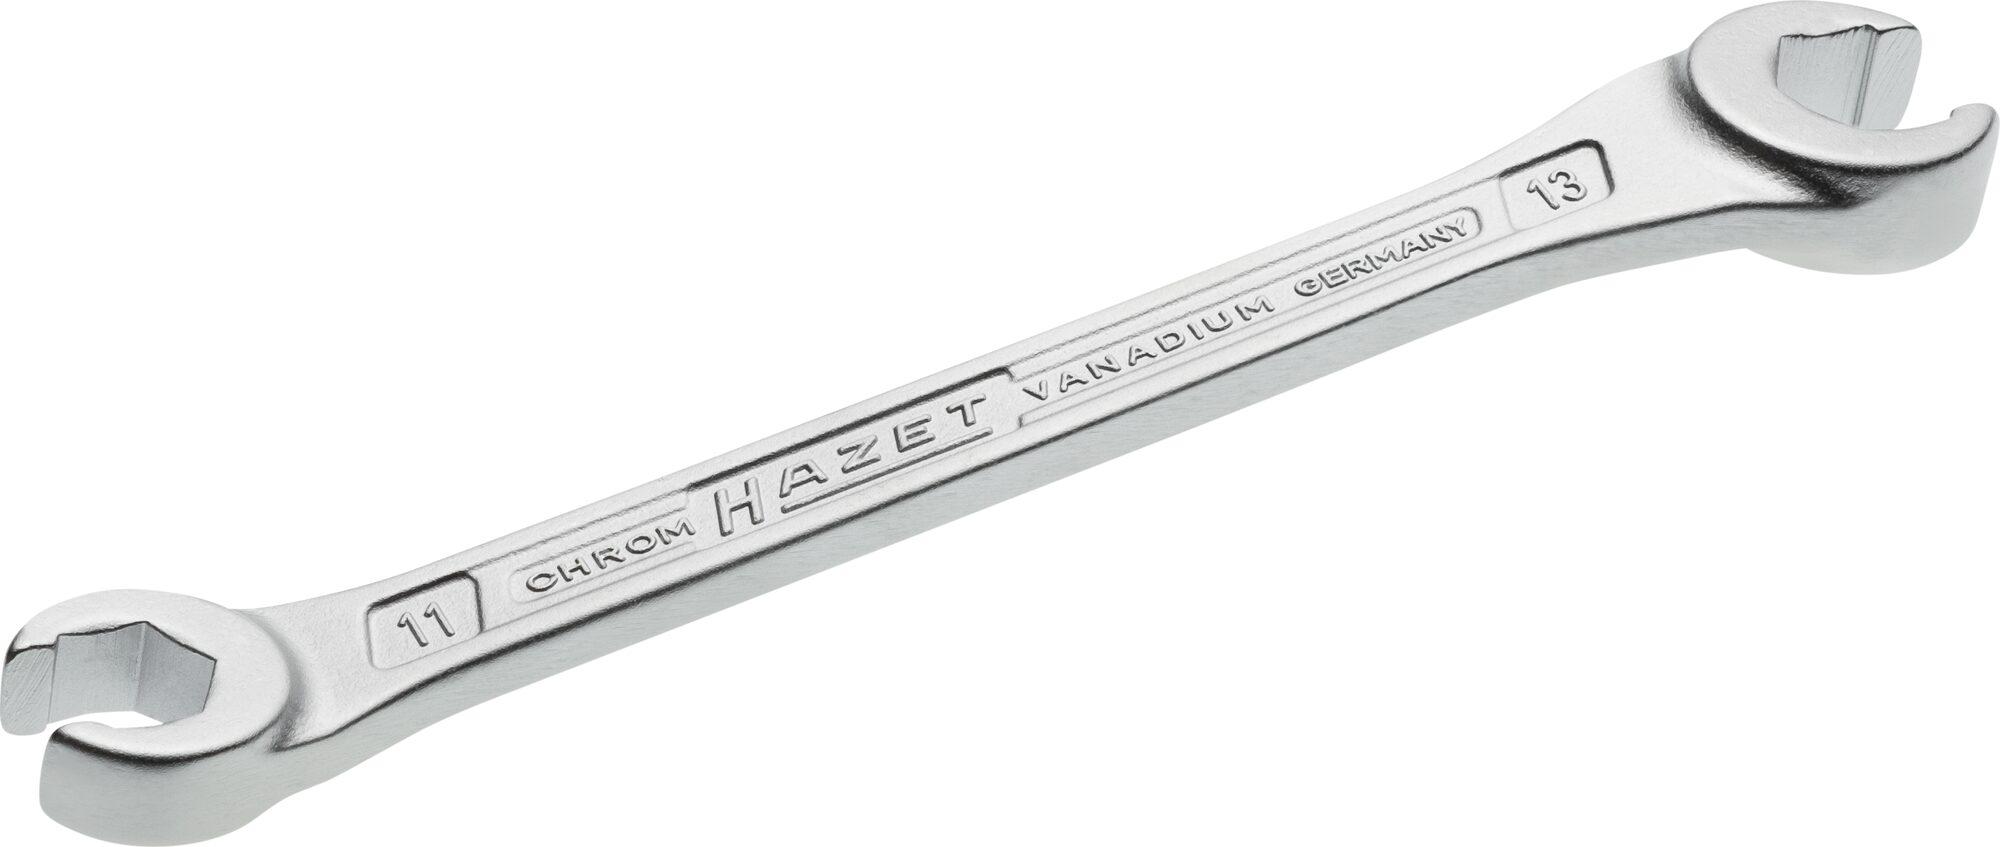 HAZET Doppel-Ringschlüssel ∙ offen 612-11X13 ∙ Außen-Sechskant Profil ∙ 11 x 13 mm